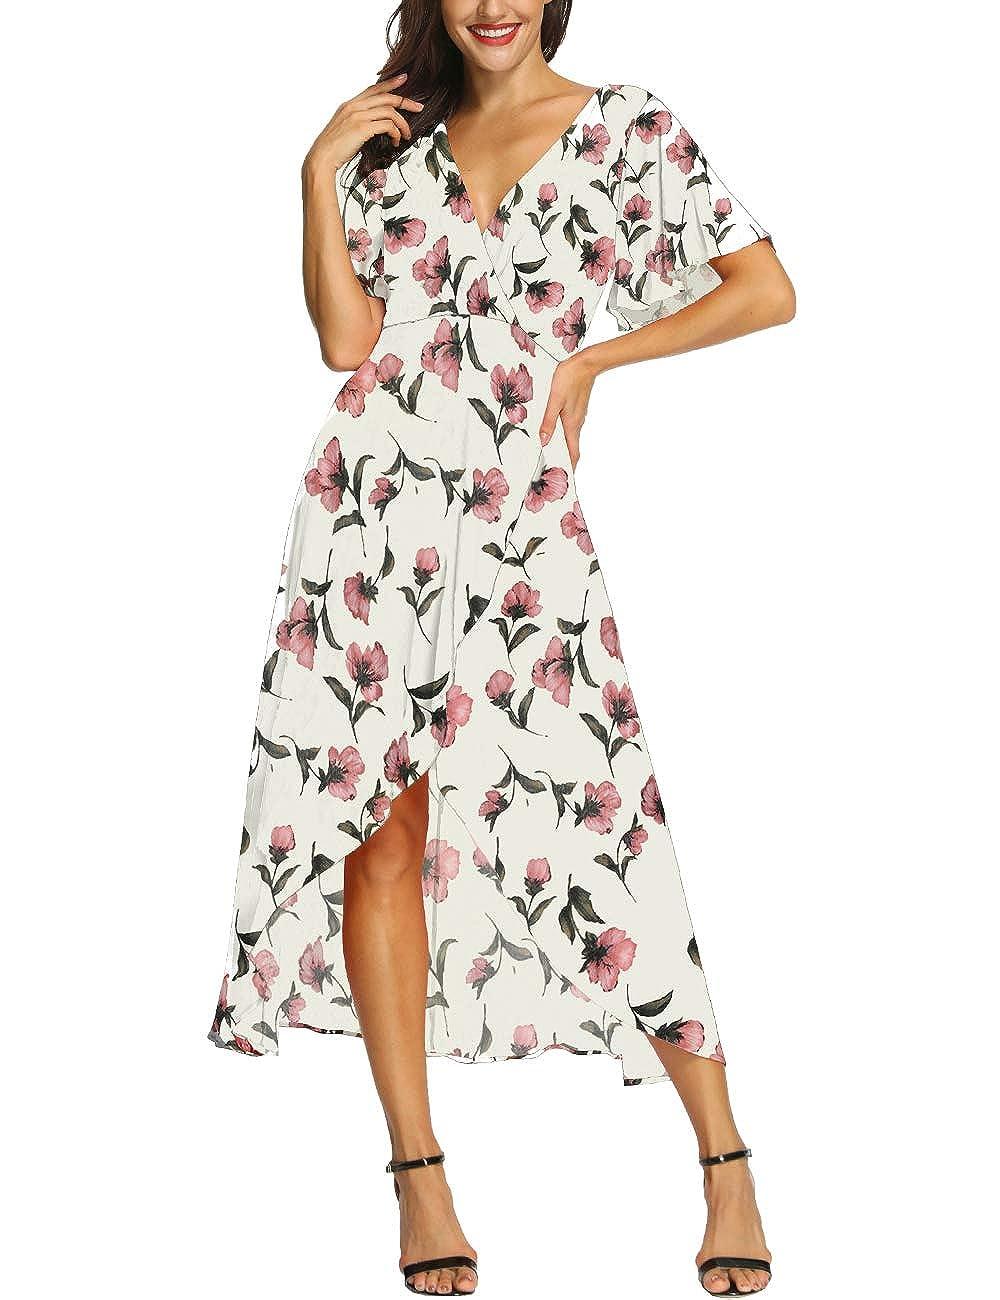 2bf398e38429 Azalosie Wrap Maxi Dress Short Sleeve V Neck Floral Flowy Front Slit High  Low Women Summer Beach Party Wedding Dress at Amazon Women's Clothing store: